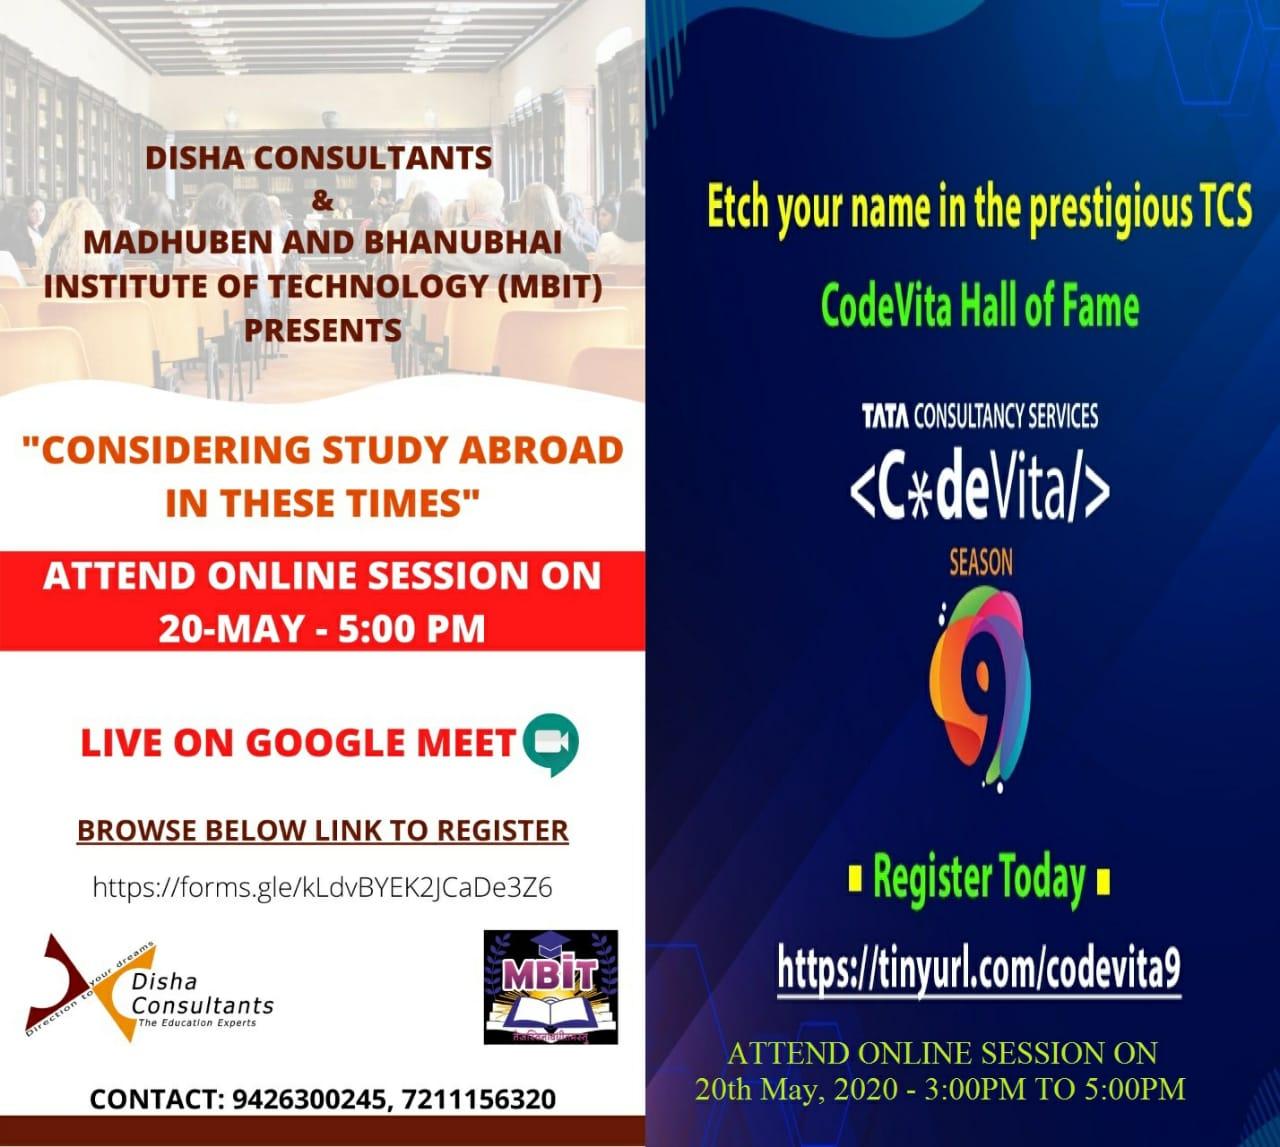 TCS Codevita & Disha Consultancy